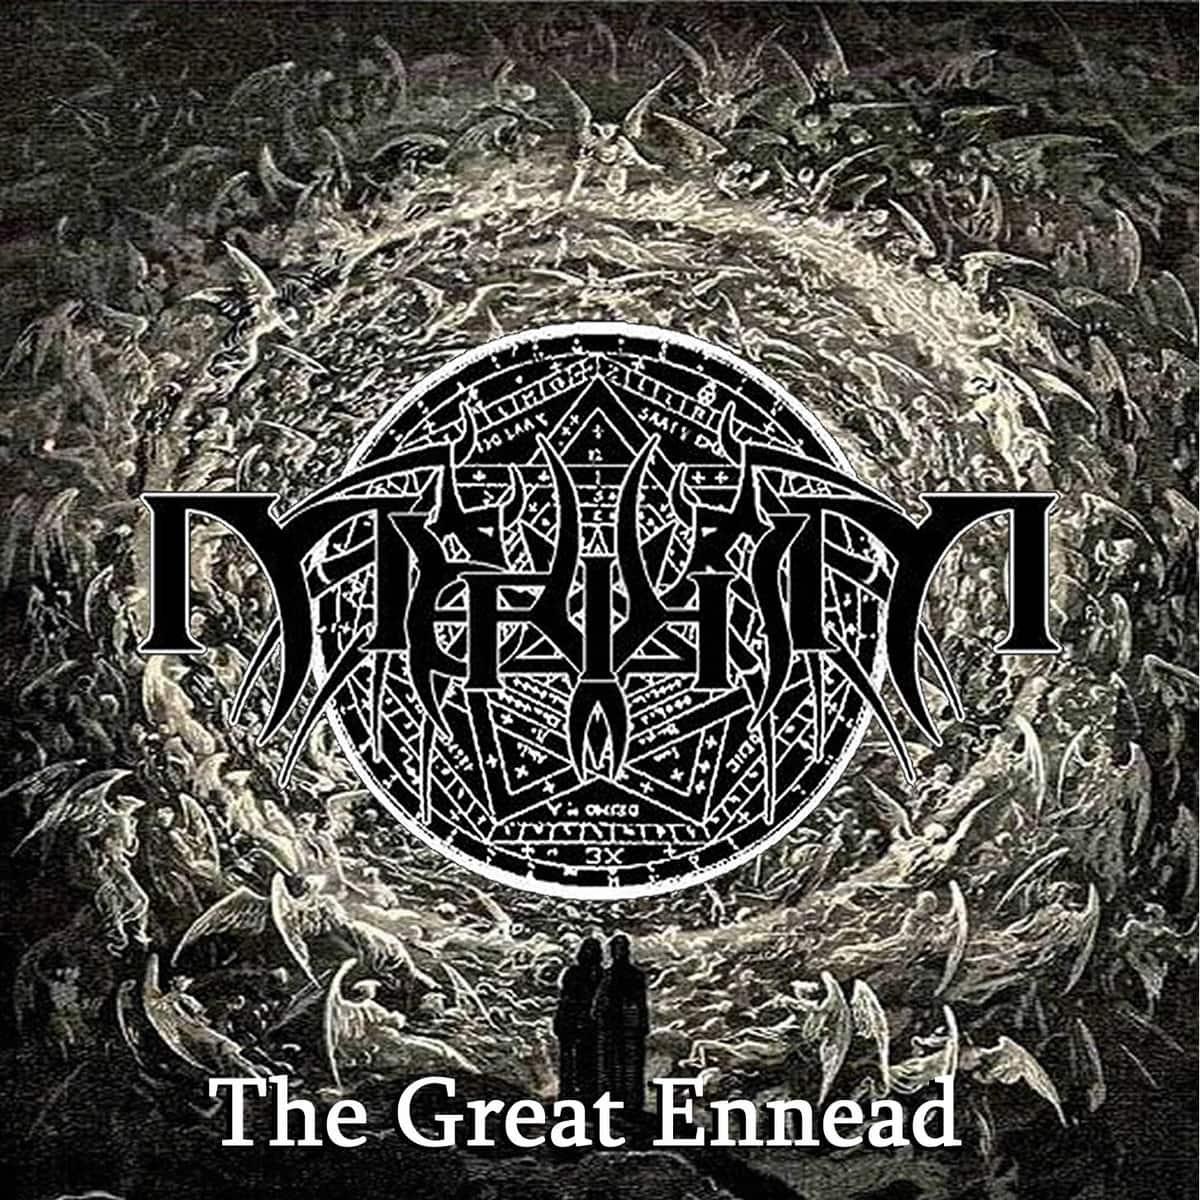 Merihim - The Great Ennead